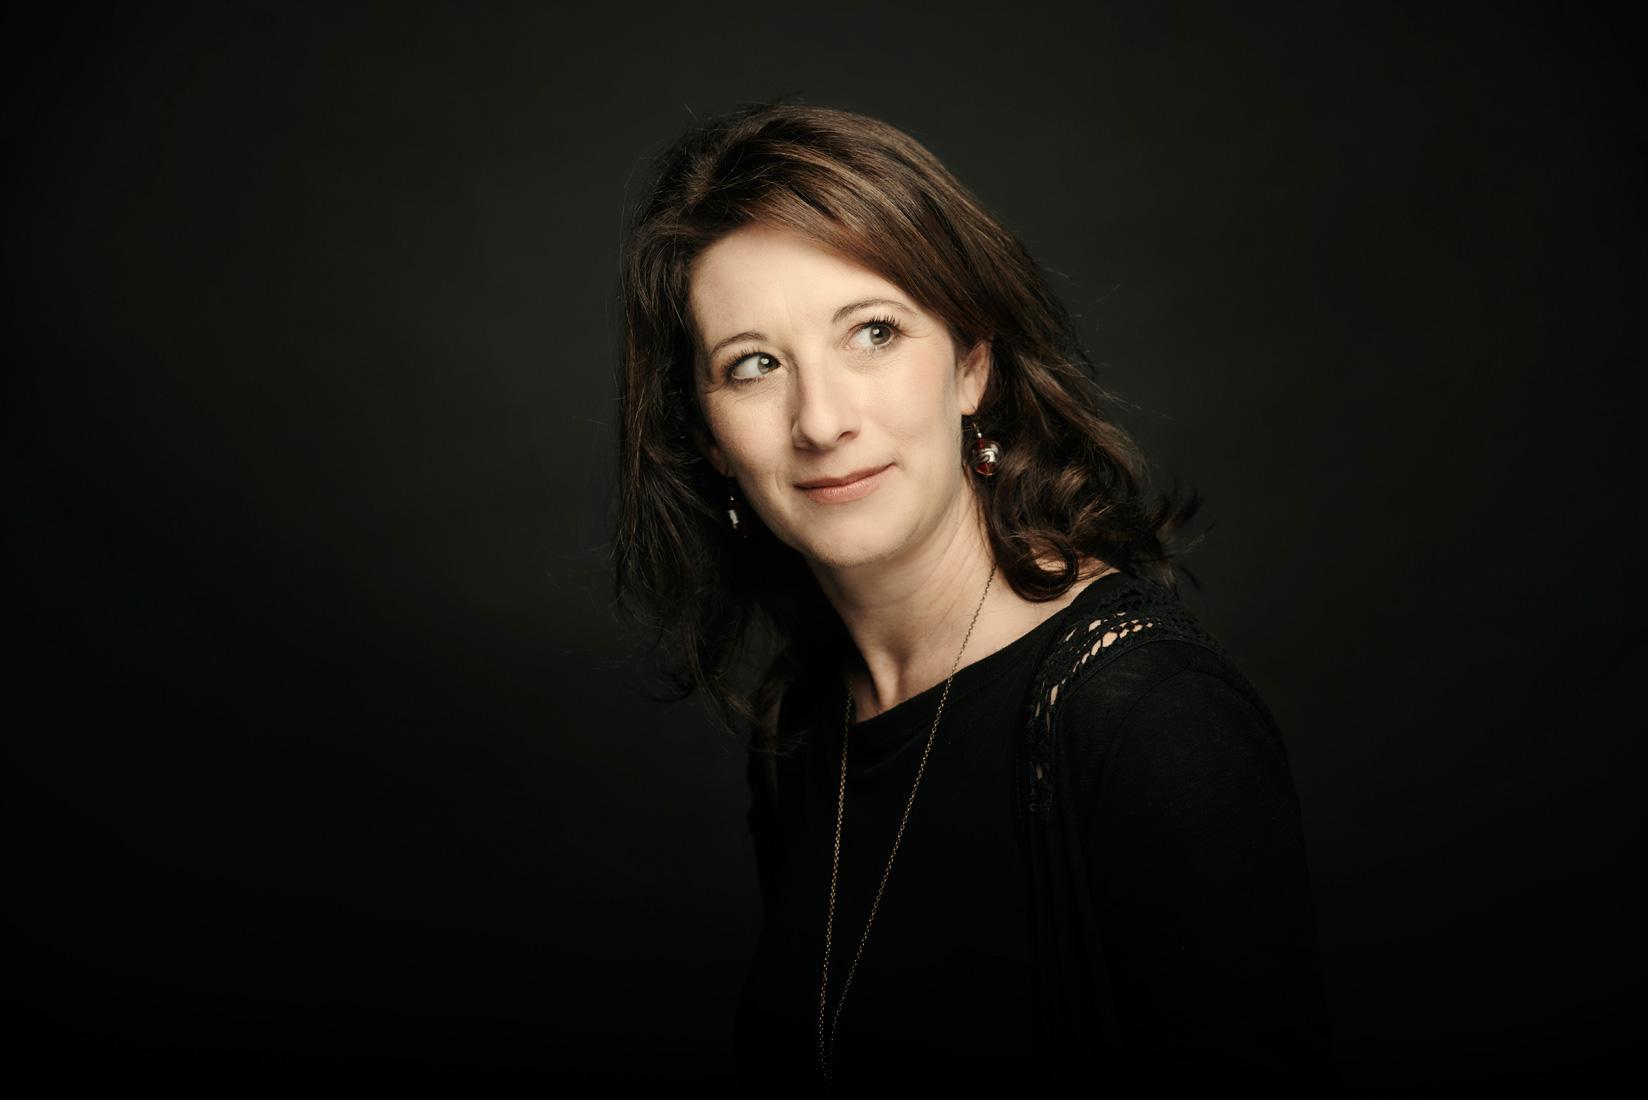 Emilie Langlais